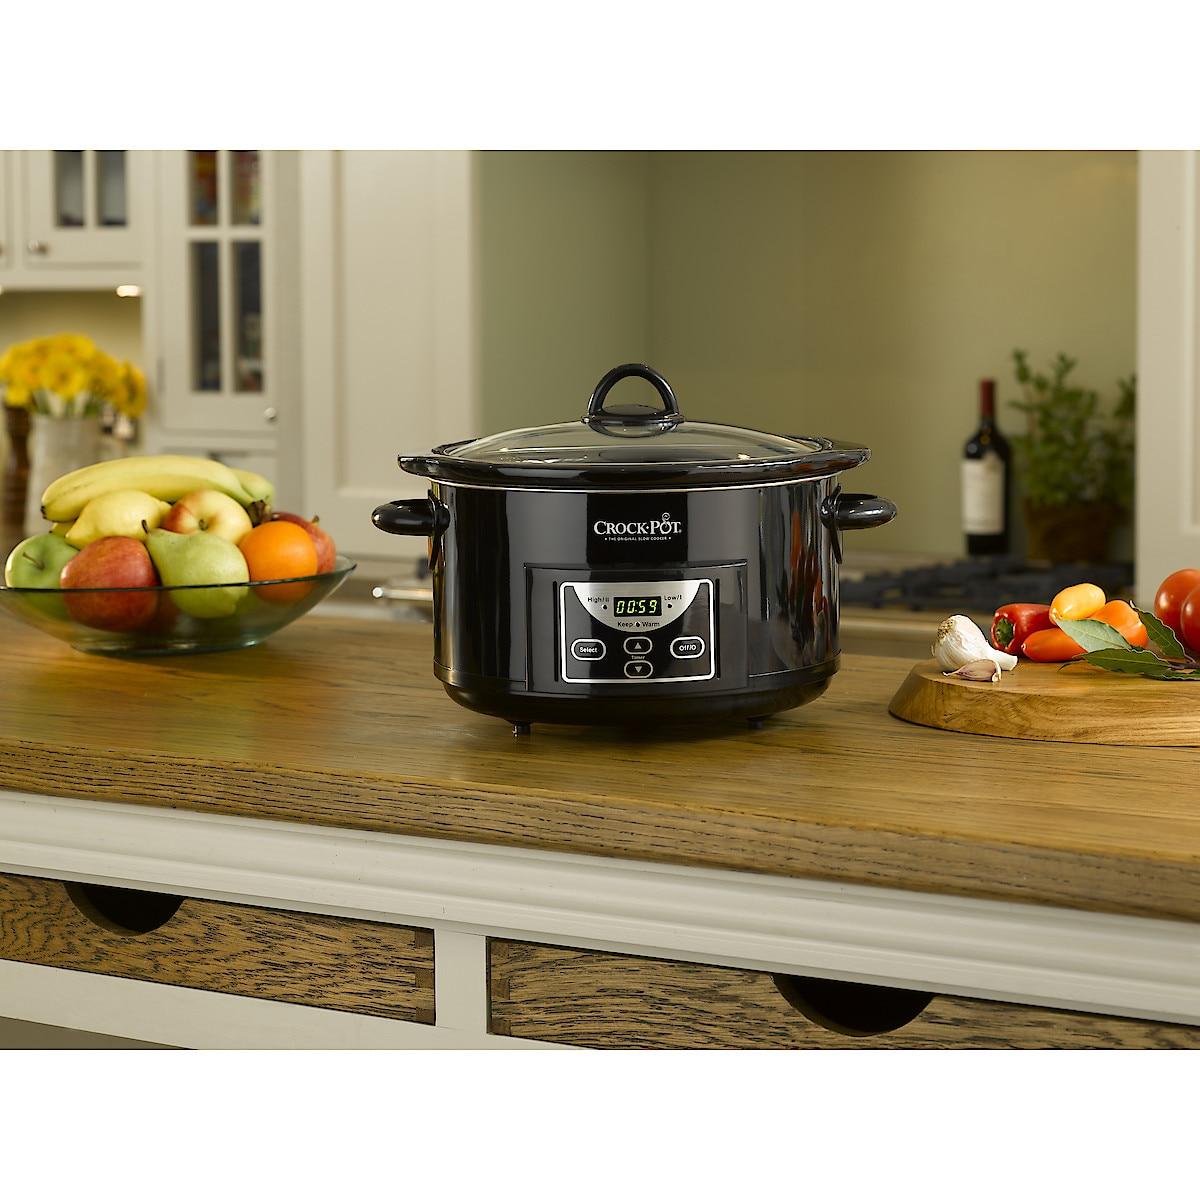 Slow cooker Crock-Pot, 4,7 l